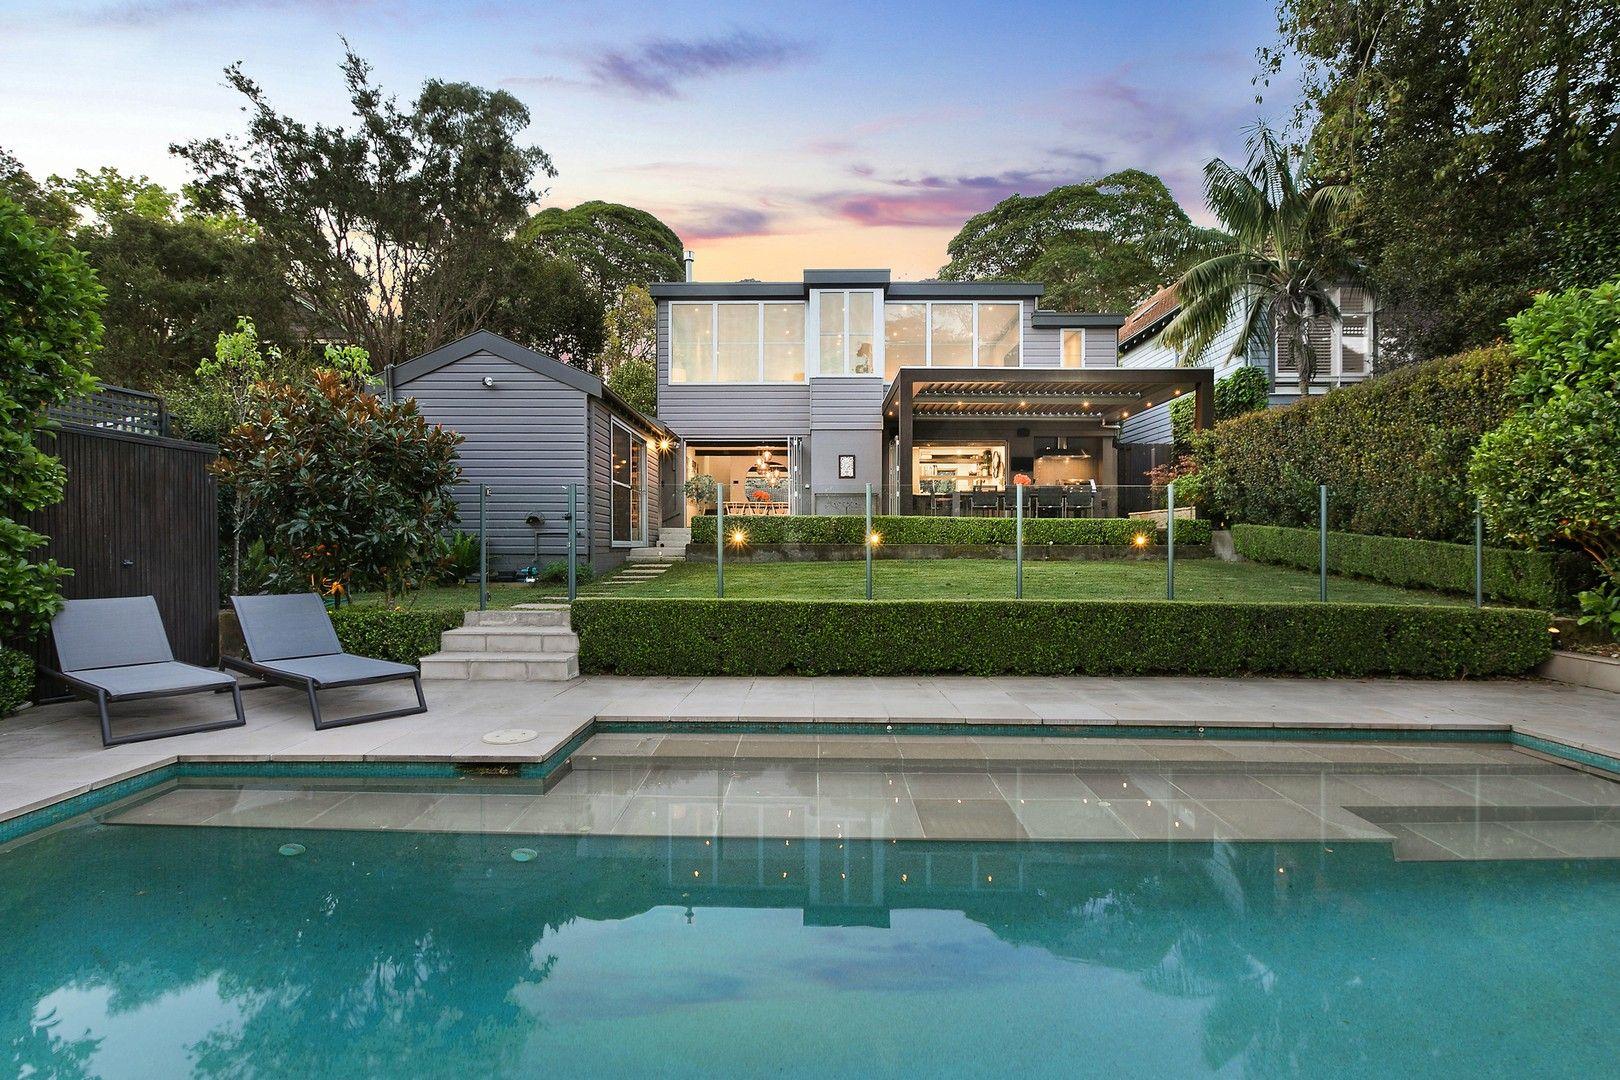 4 bedrooms House in 20 Cameron Avenue ARTARMON NSW, 2064